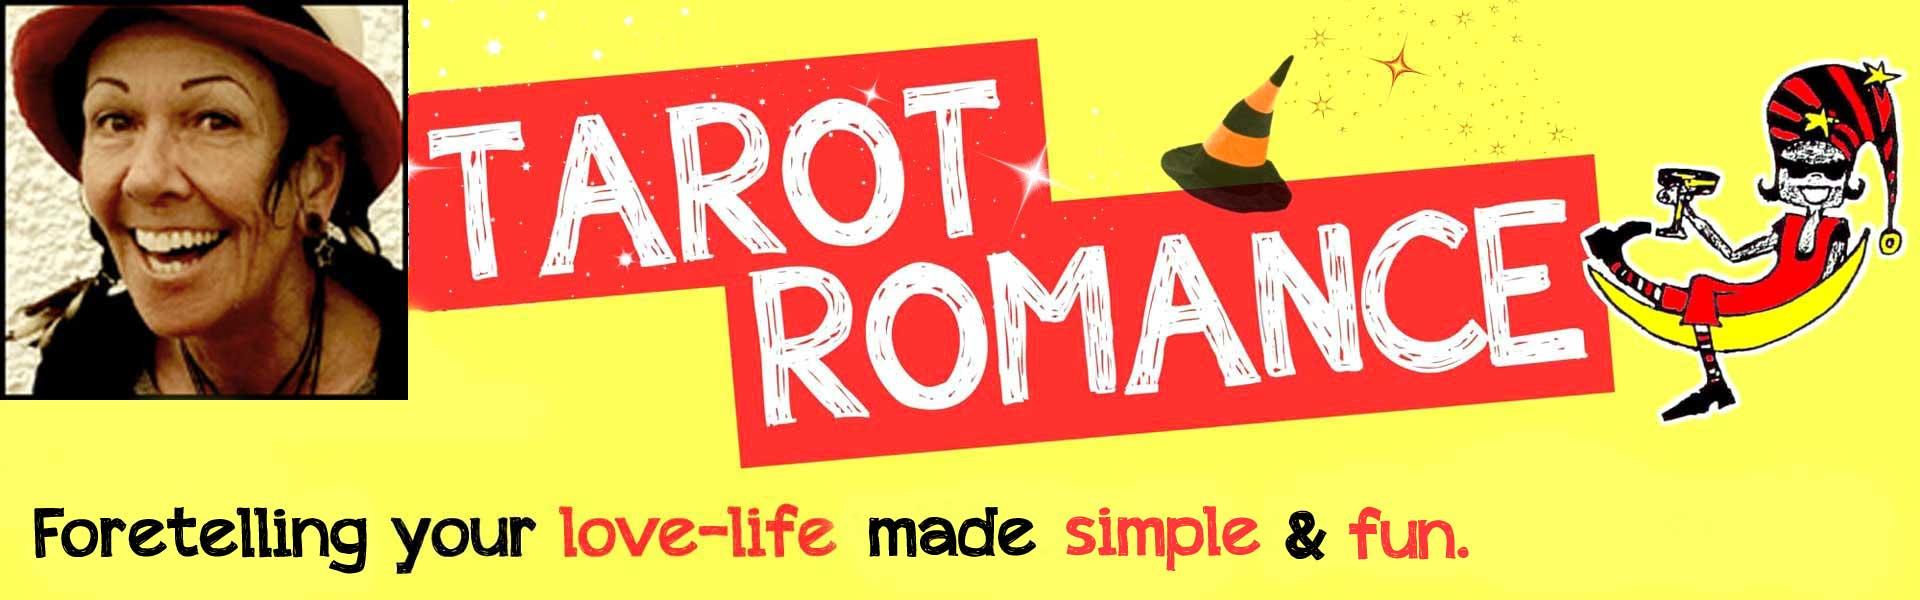 Tarot Romance